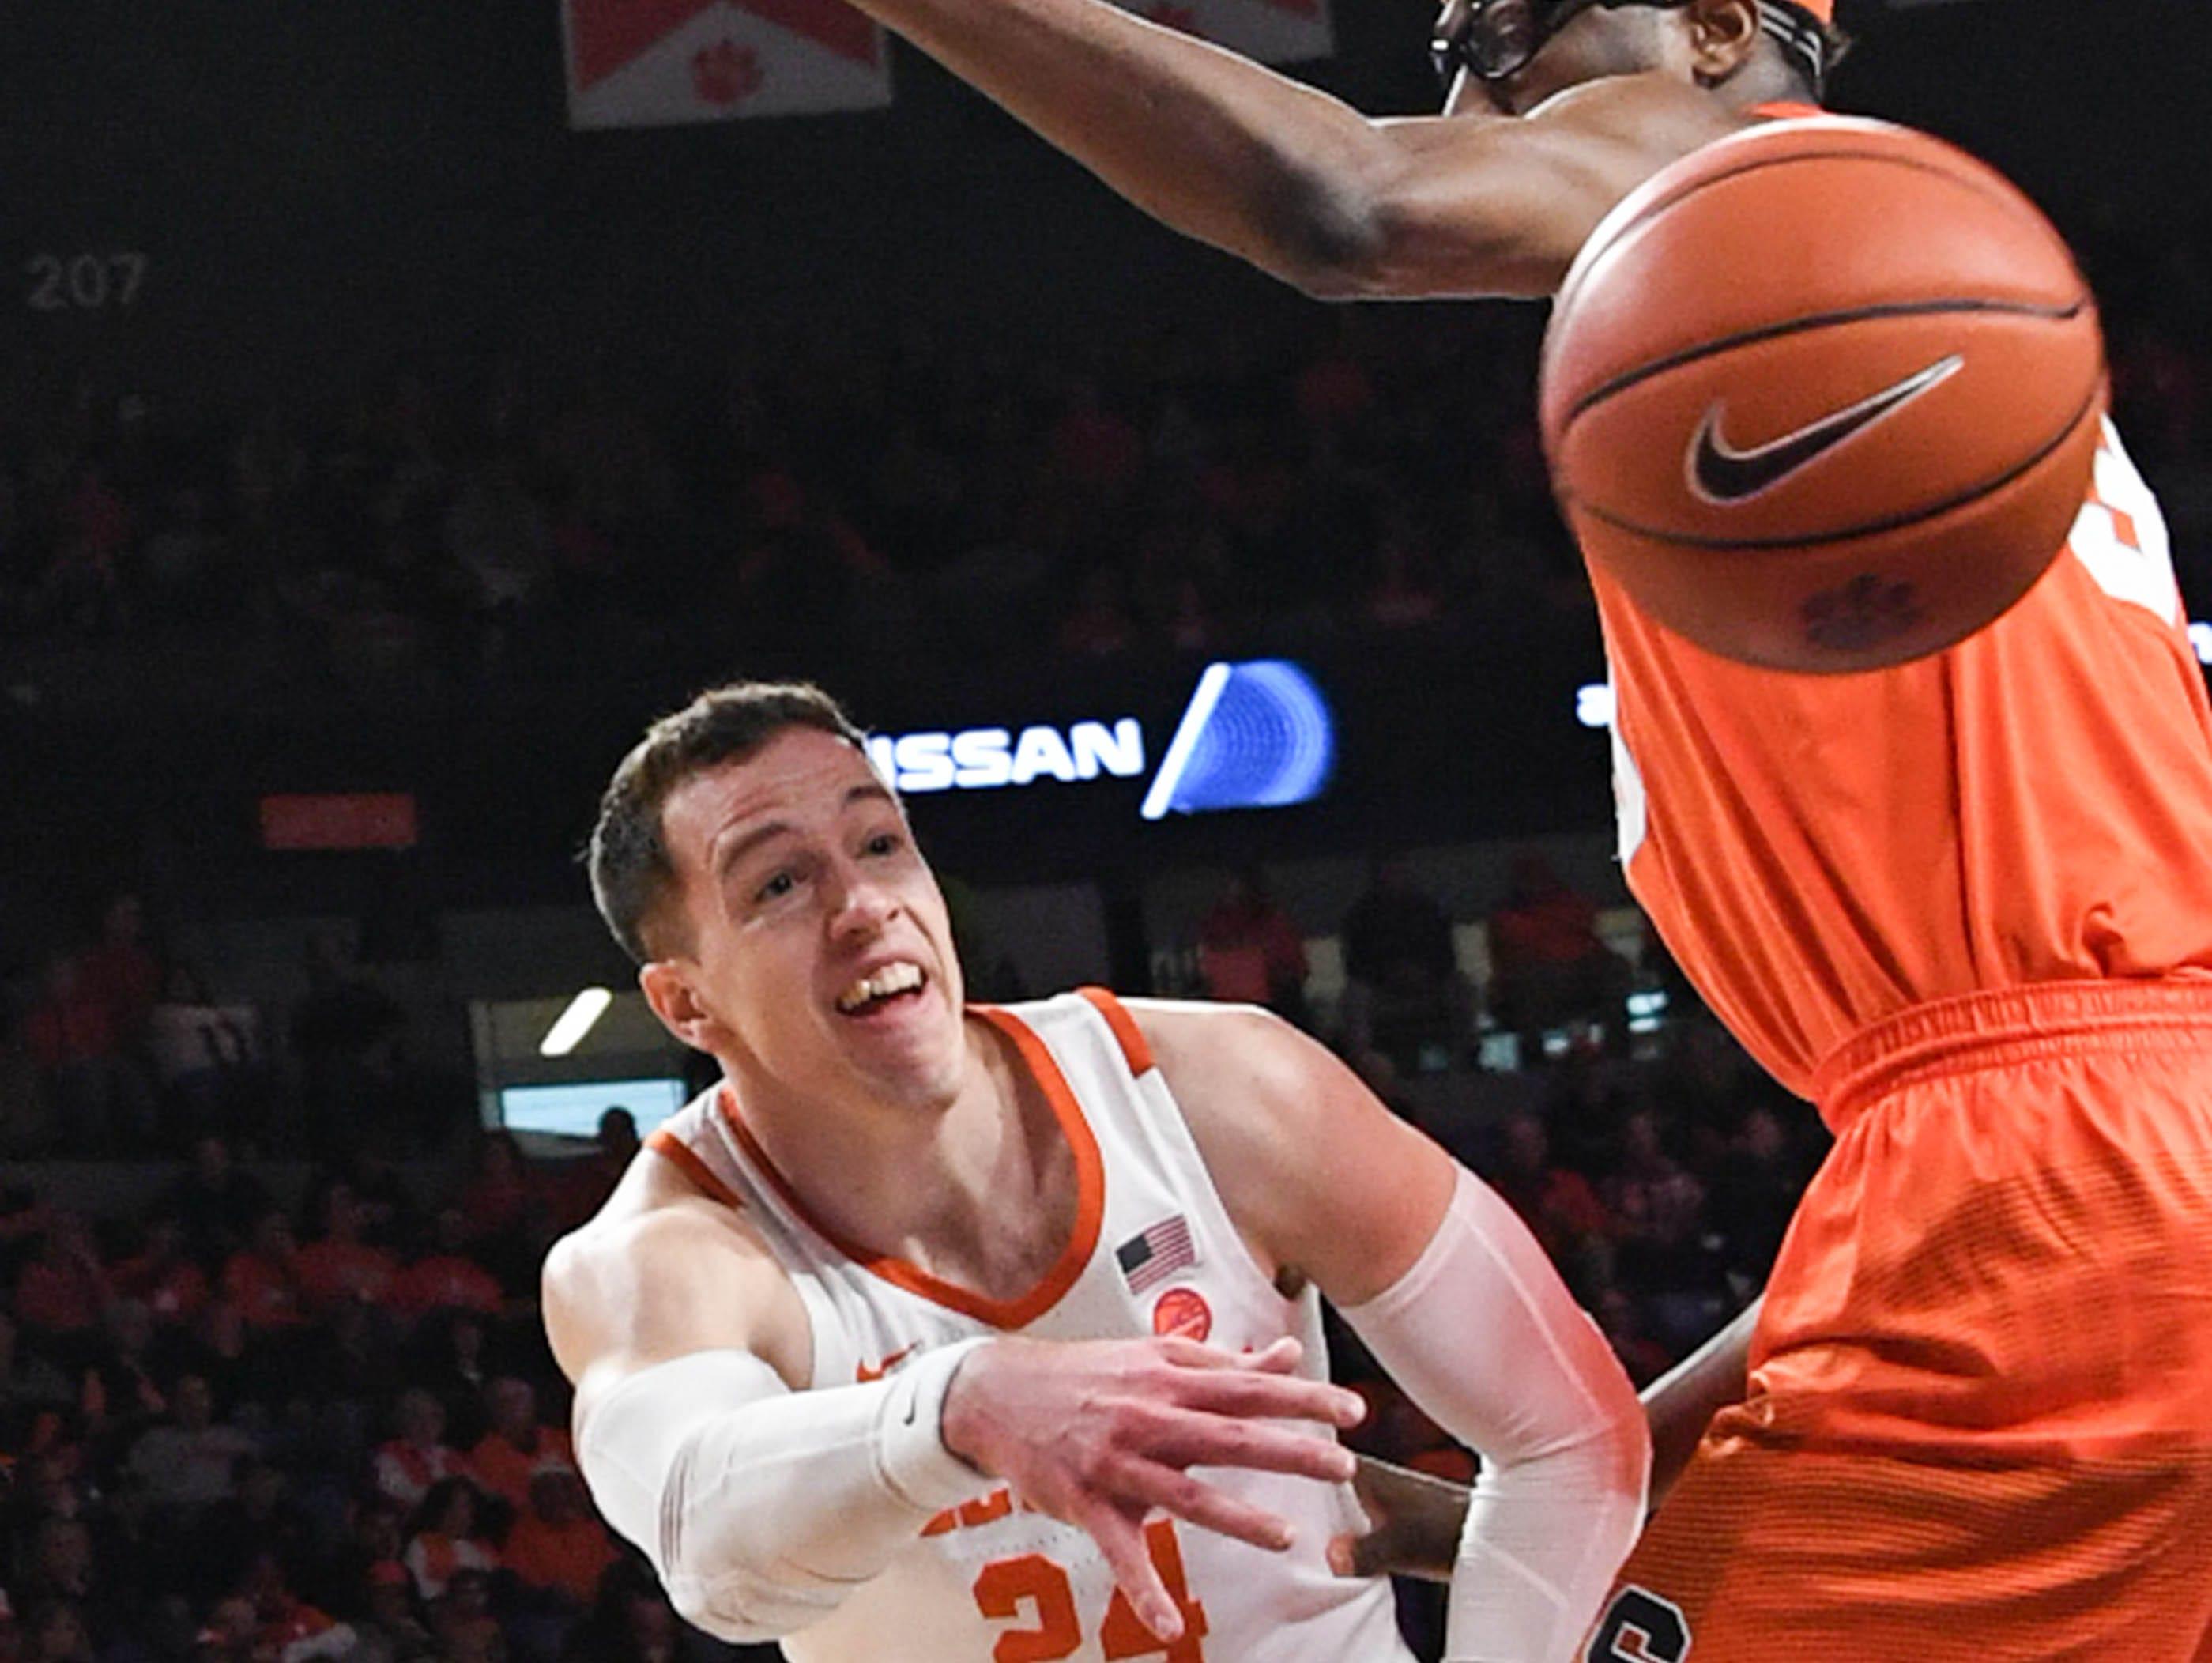 Clemson forward David Skara (24) passes around Syracuse forward Elijah Hughes(33) during the first half in Littlejohn Coliseum in Clemson Saturday, March 9, 2019.